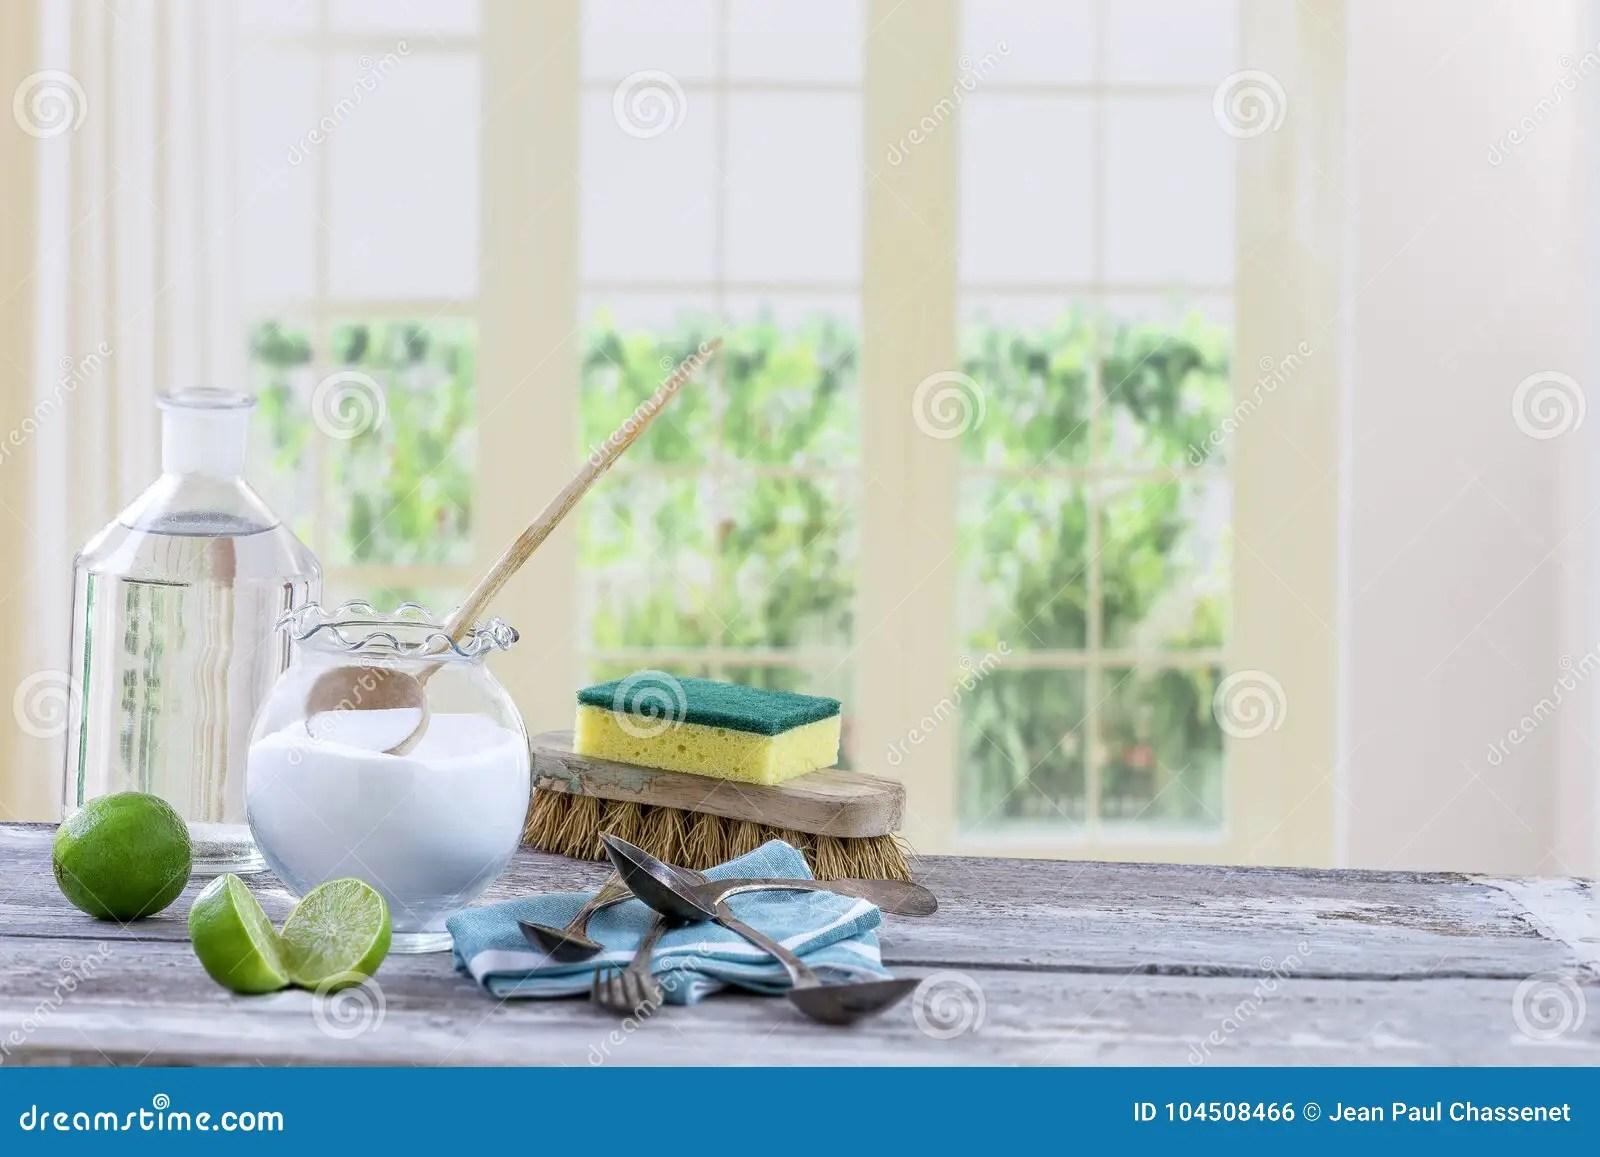 wood table kitchen ventless hood 环境友好的自然擦净剂发面苏打 柠檬和布料在木桌厨房背景 库存照片 柠檬和布料在木桌窗口背景